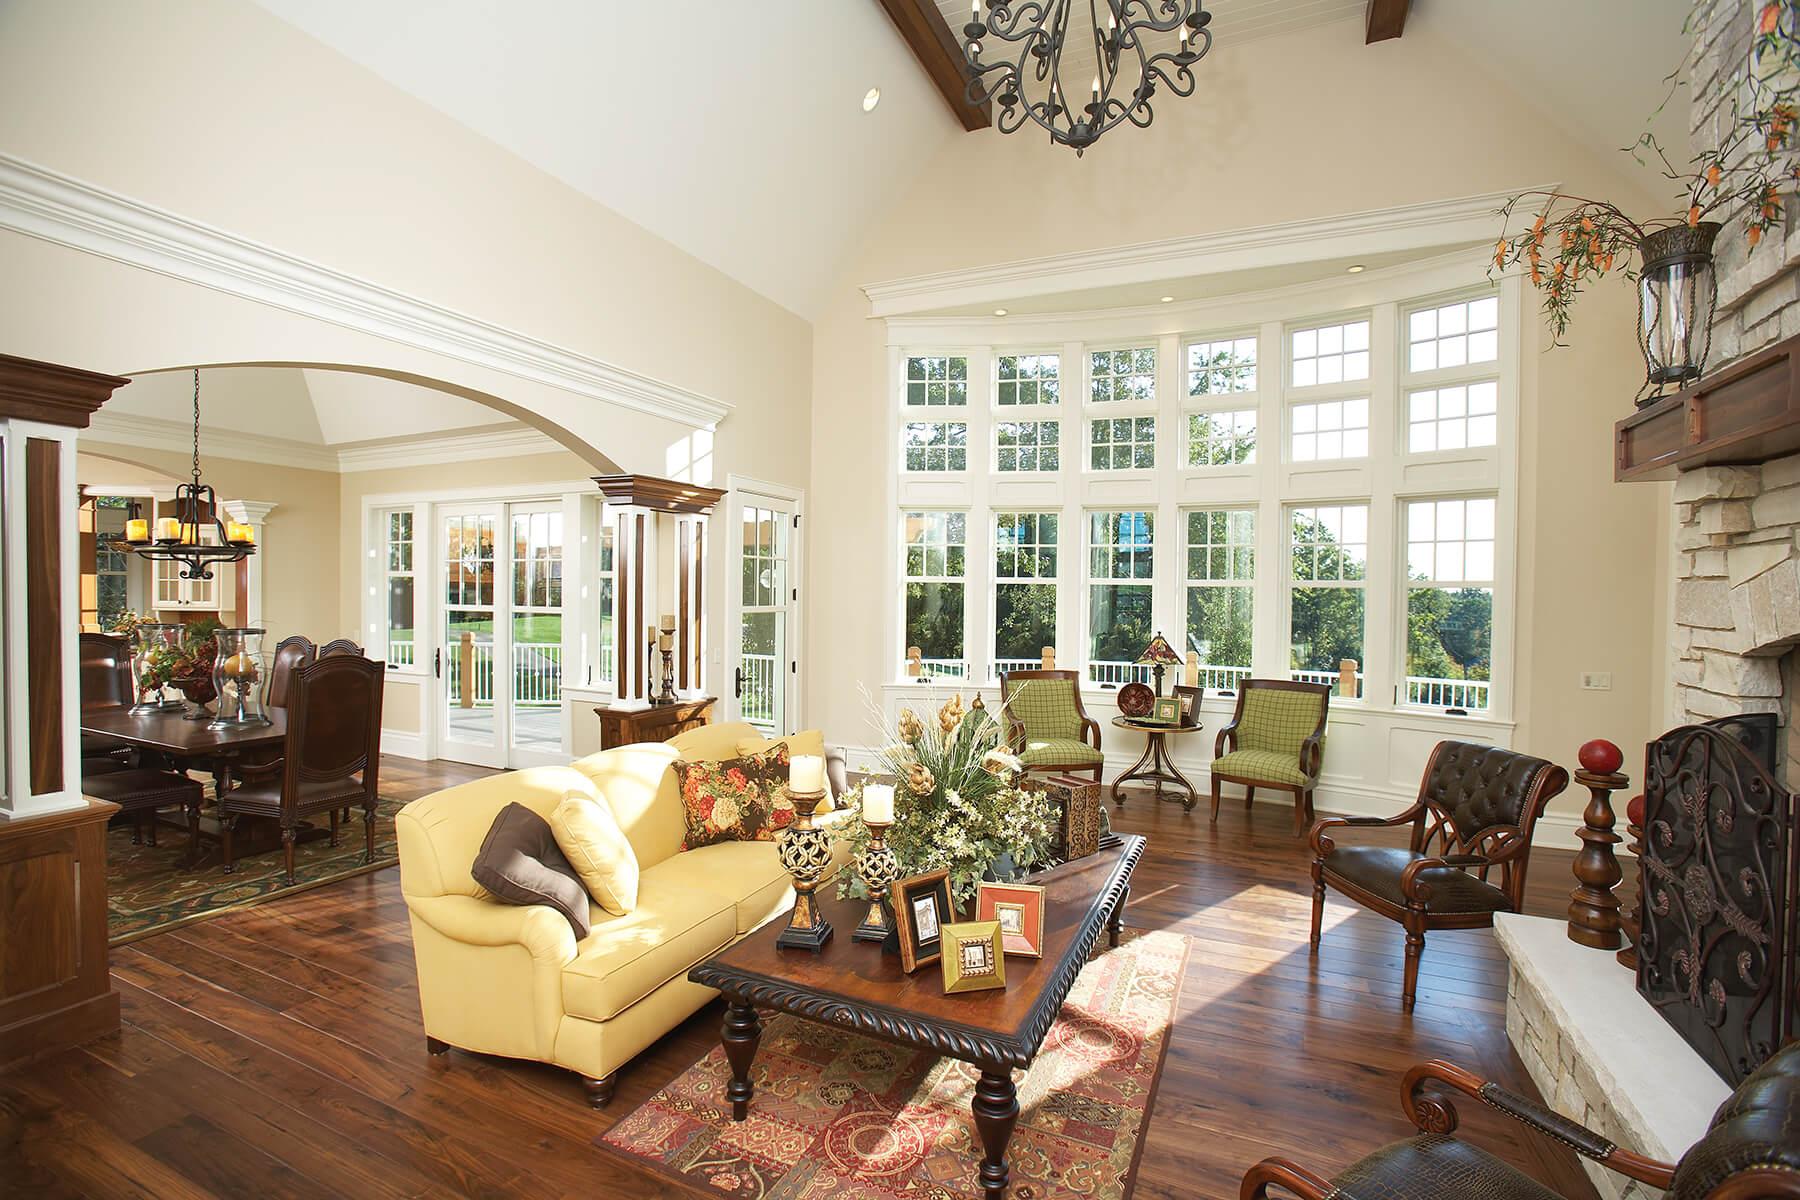 kolbe-crank-out-casement-window-sliding-patio-door-casement-transom